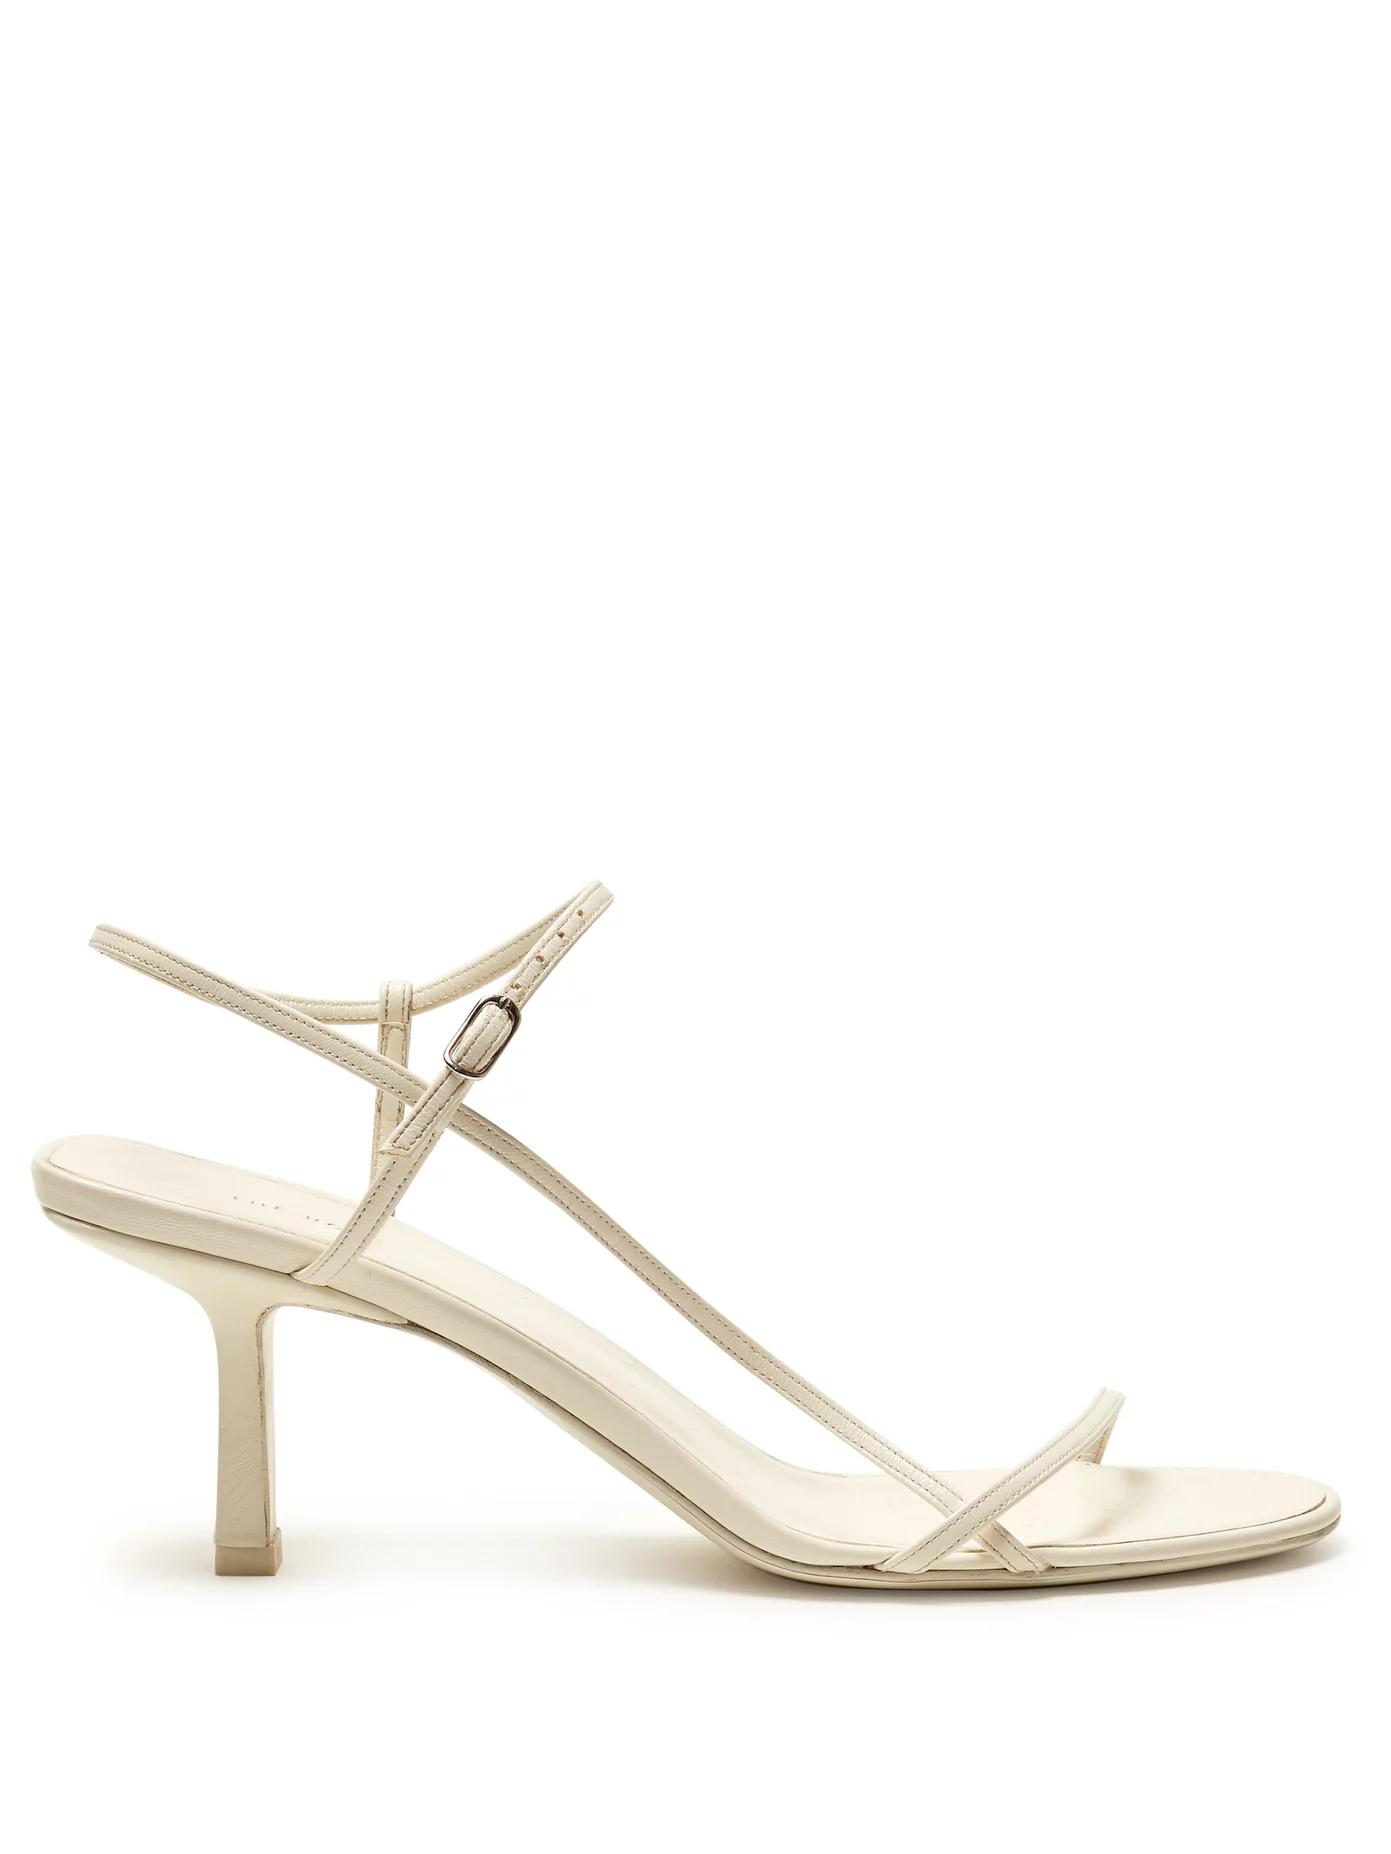 0a032d776f50 Walk The Walk 2014 Bridal Shoe Trends And